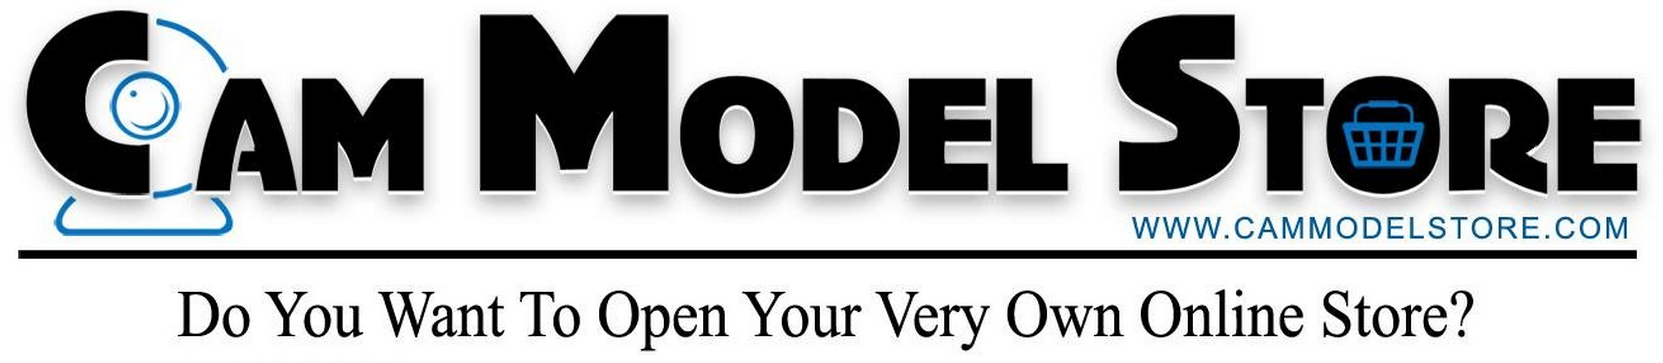 Cam Model Store